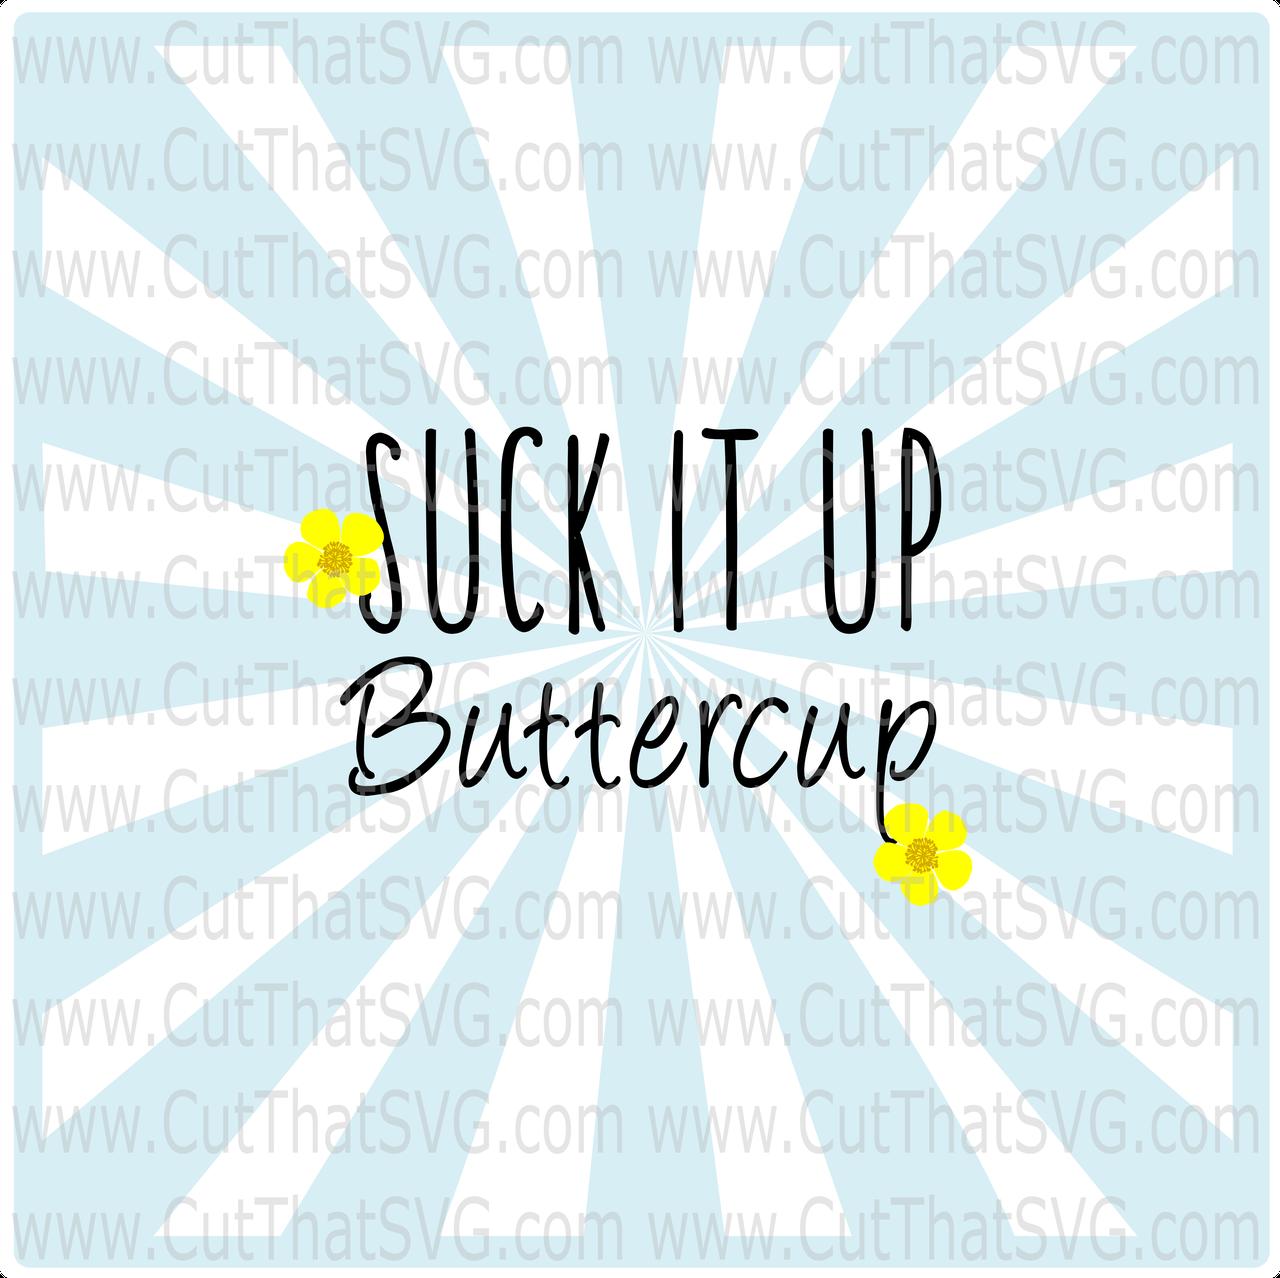 Suck it Up Buttercup.